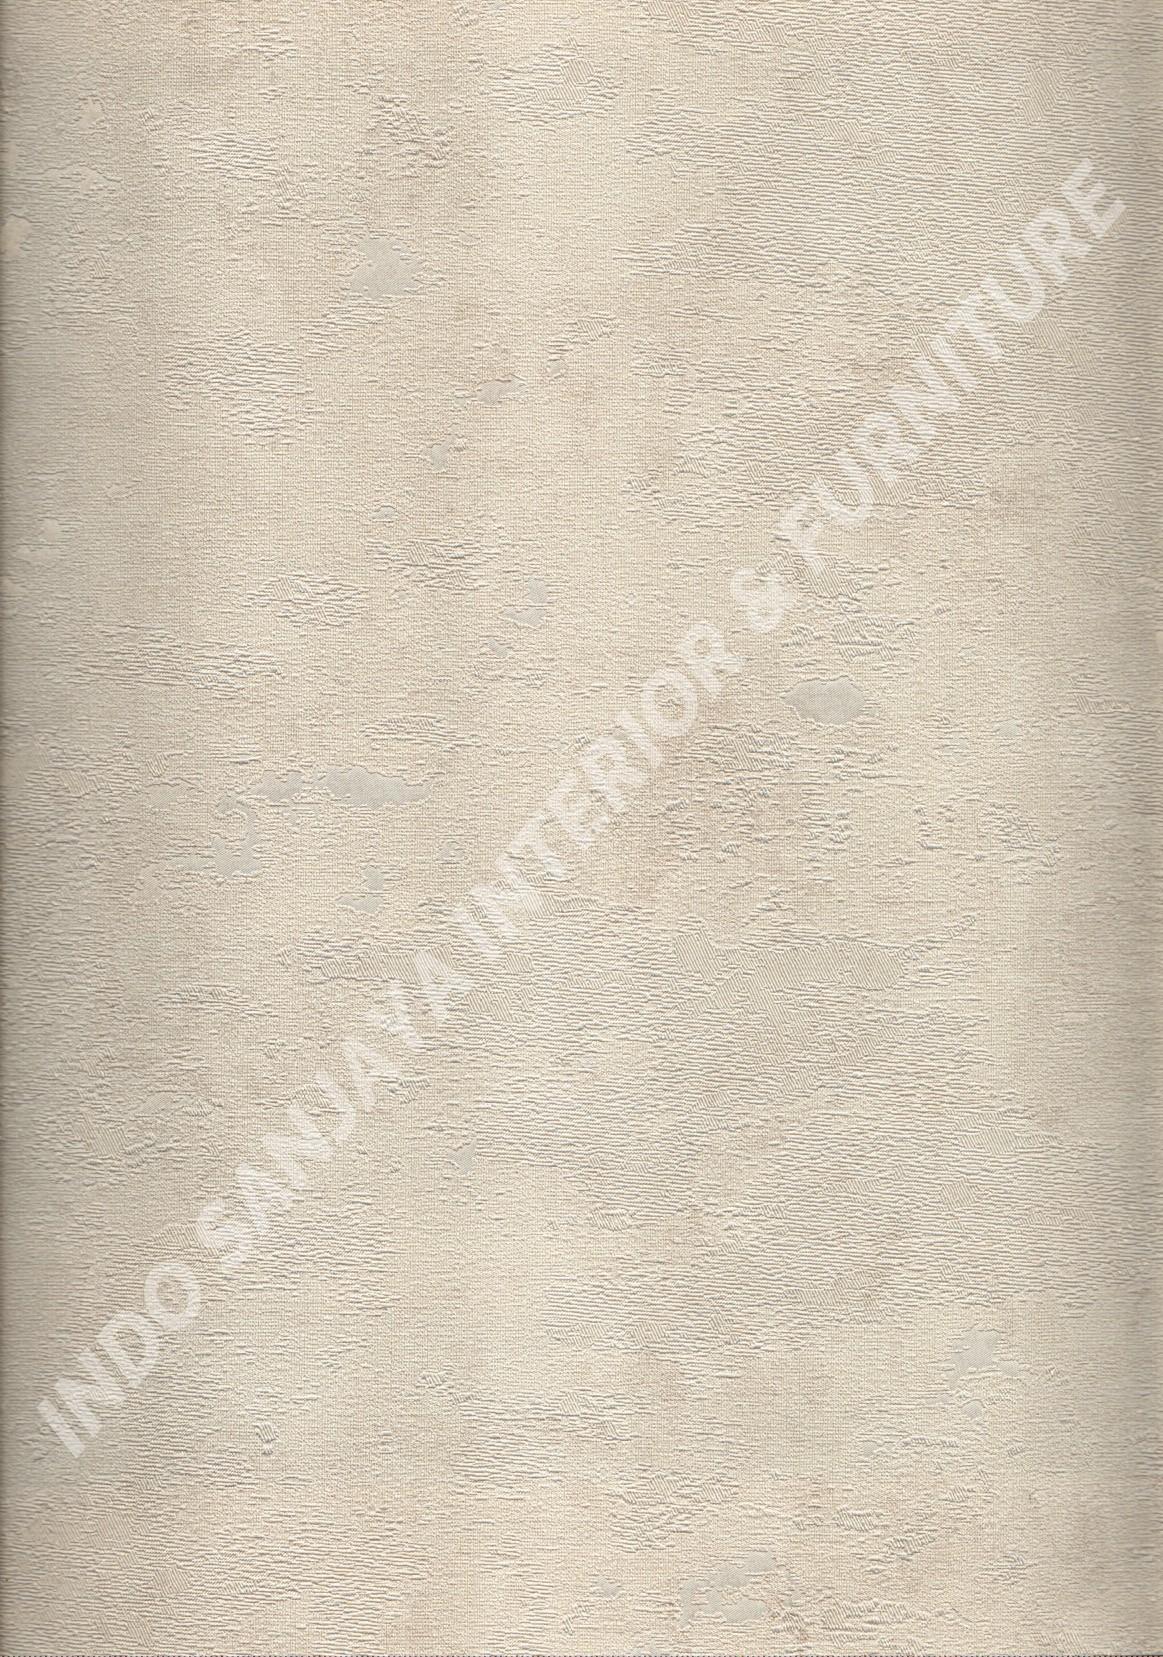 wallpaper   Wallpaper Minimalis Polos 5007-2:5007-2 corak  warna